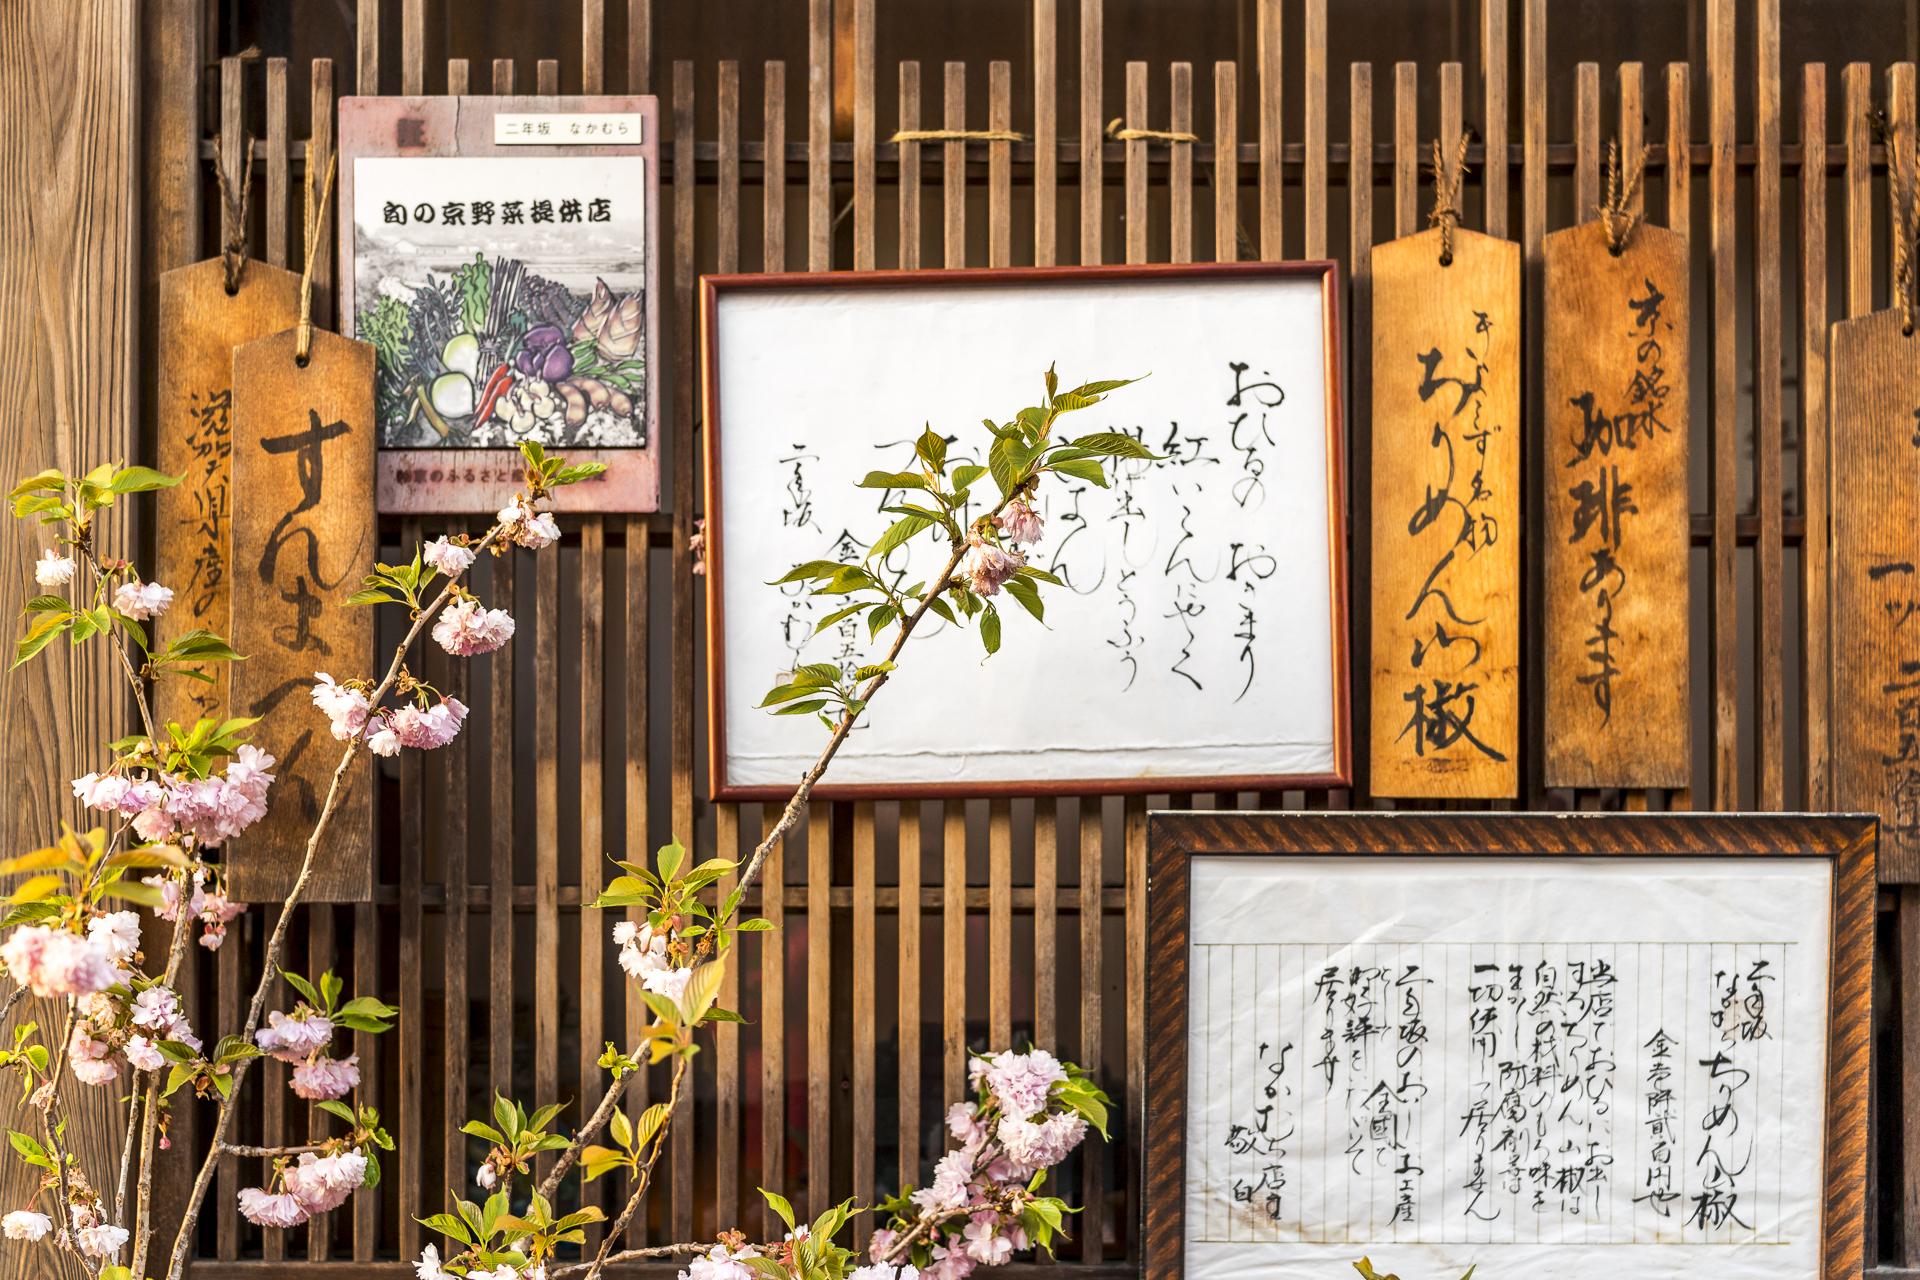 Details in Higashiyama Kyoto